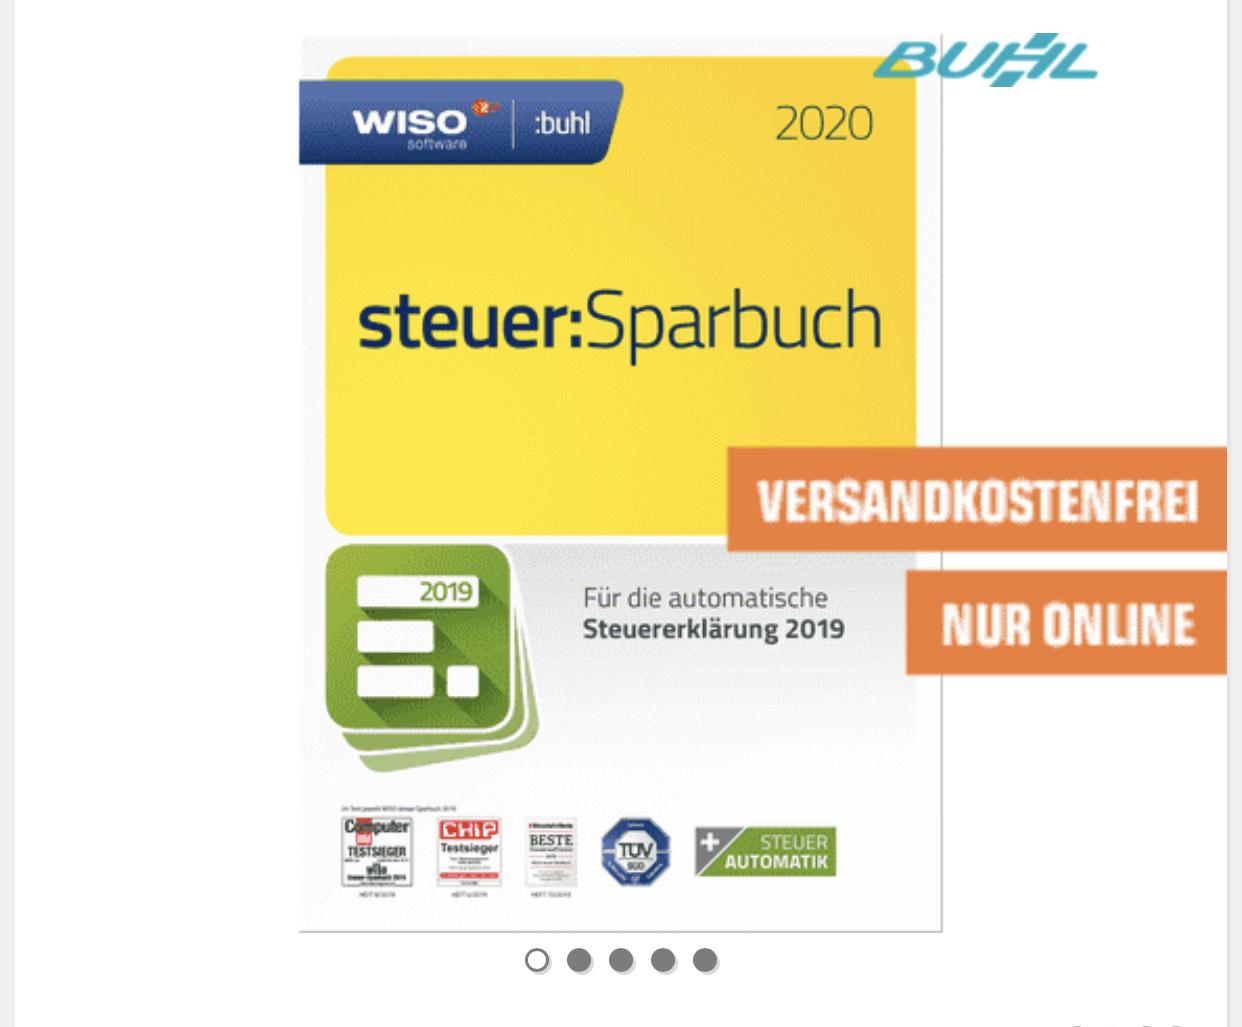 WISO Steuer Sparbuch 2020 Box